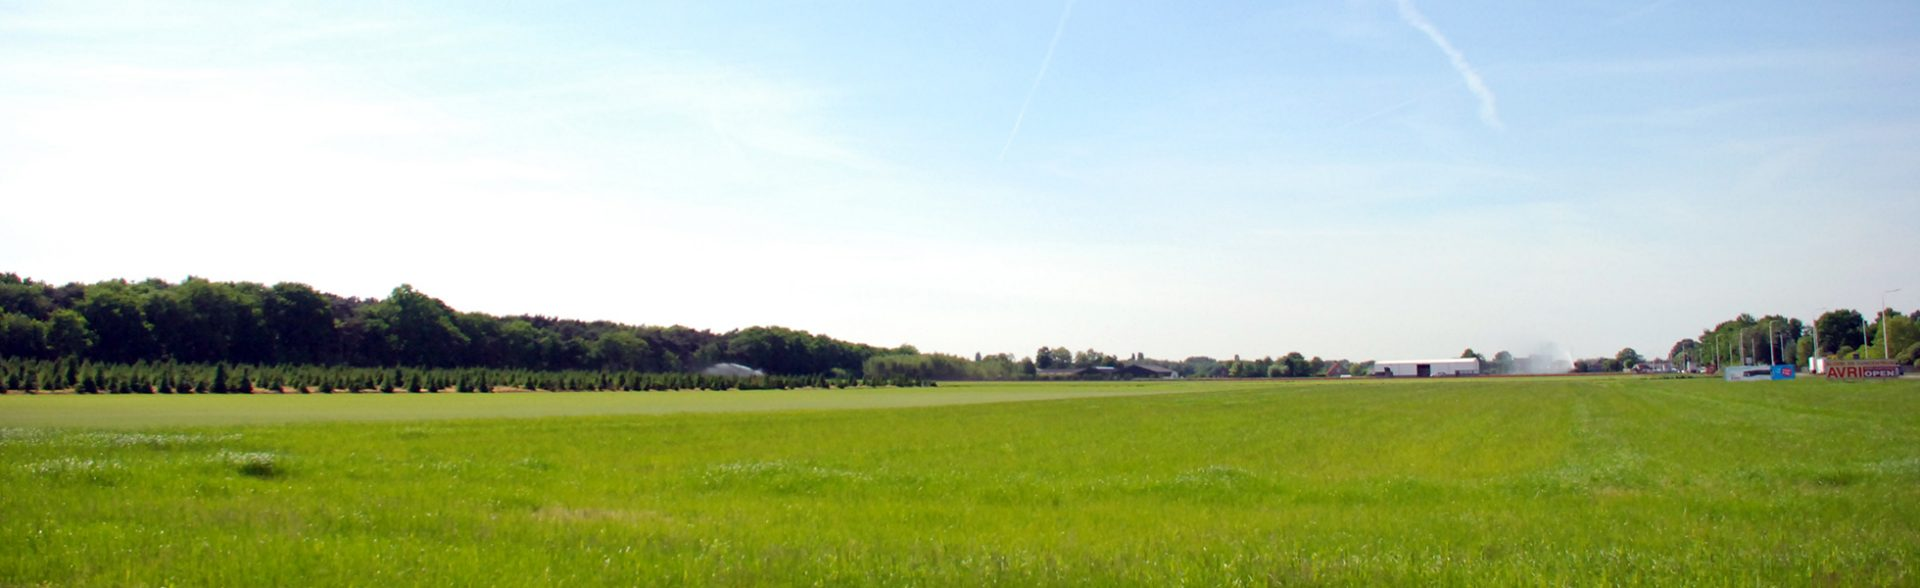 Dromenlab Oosterhout-Dongen - landschap